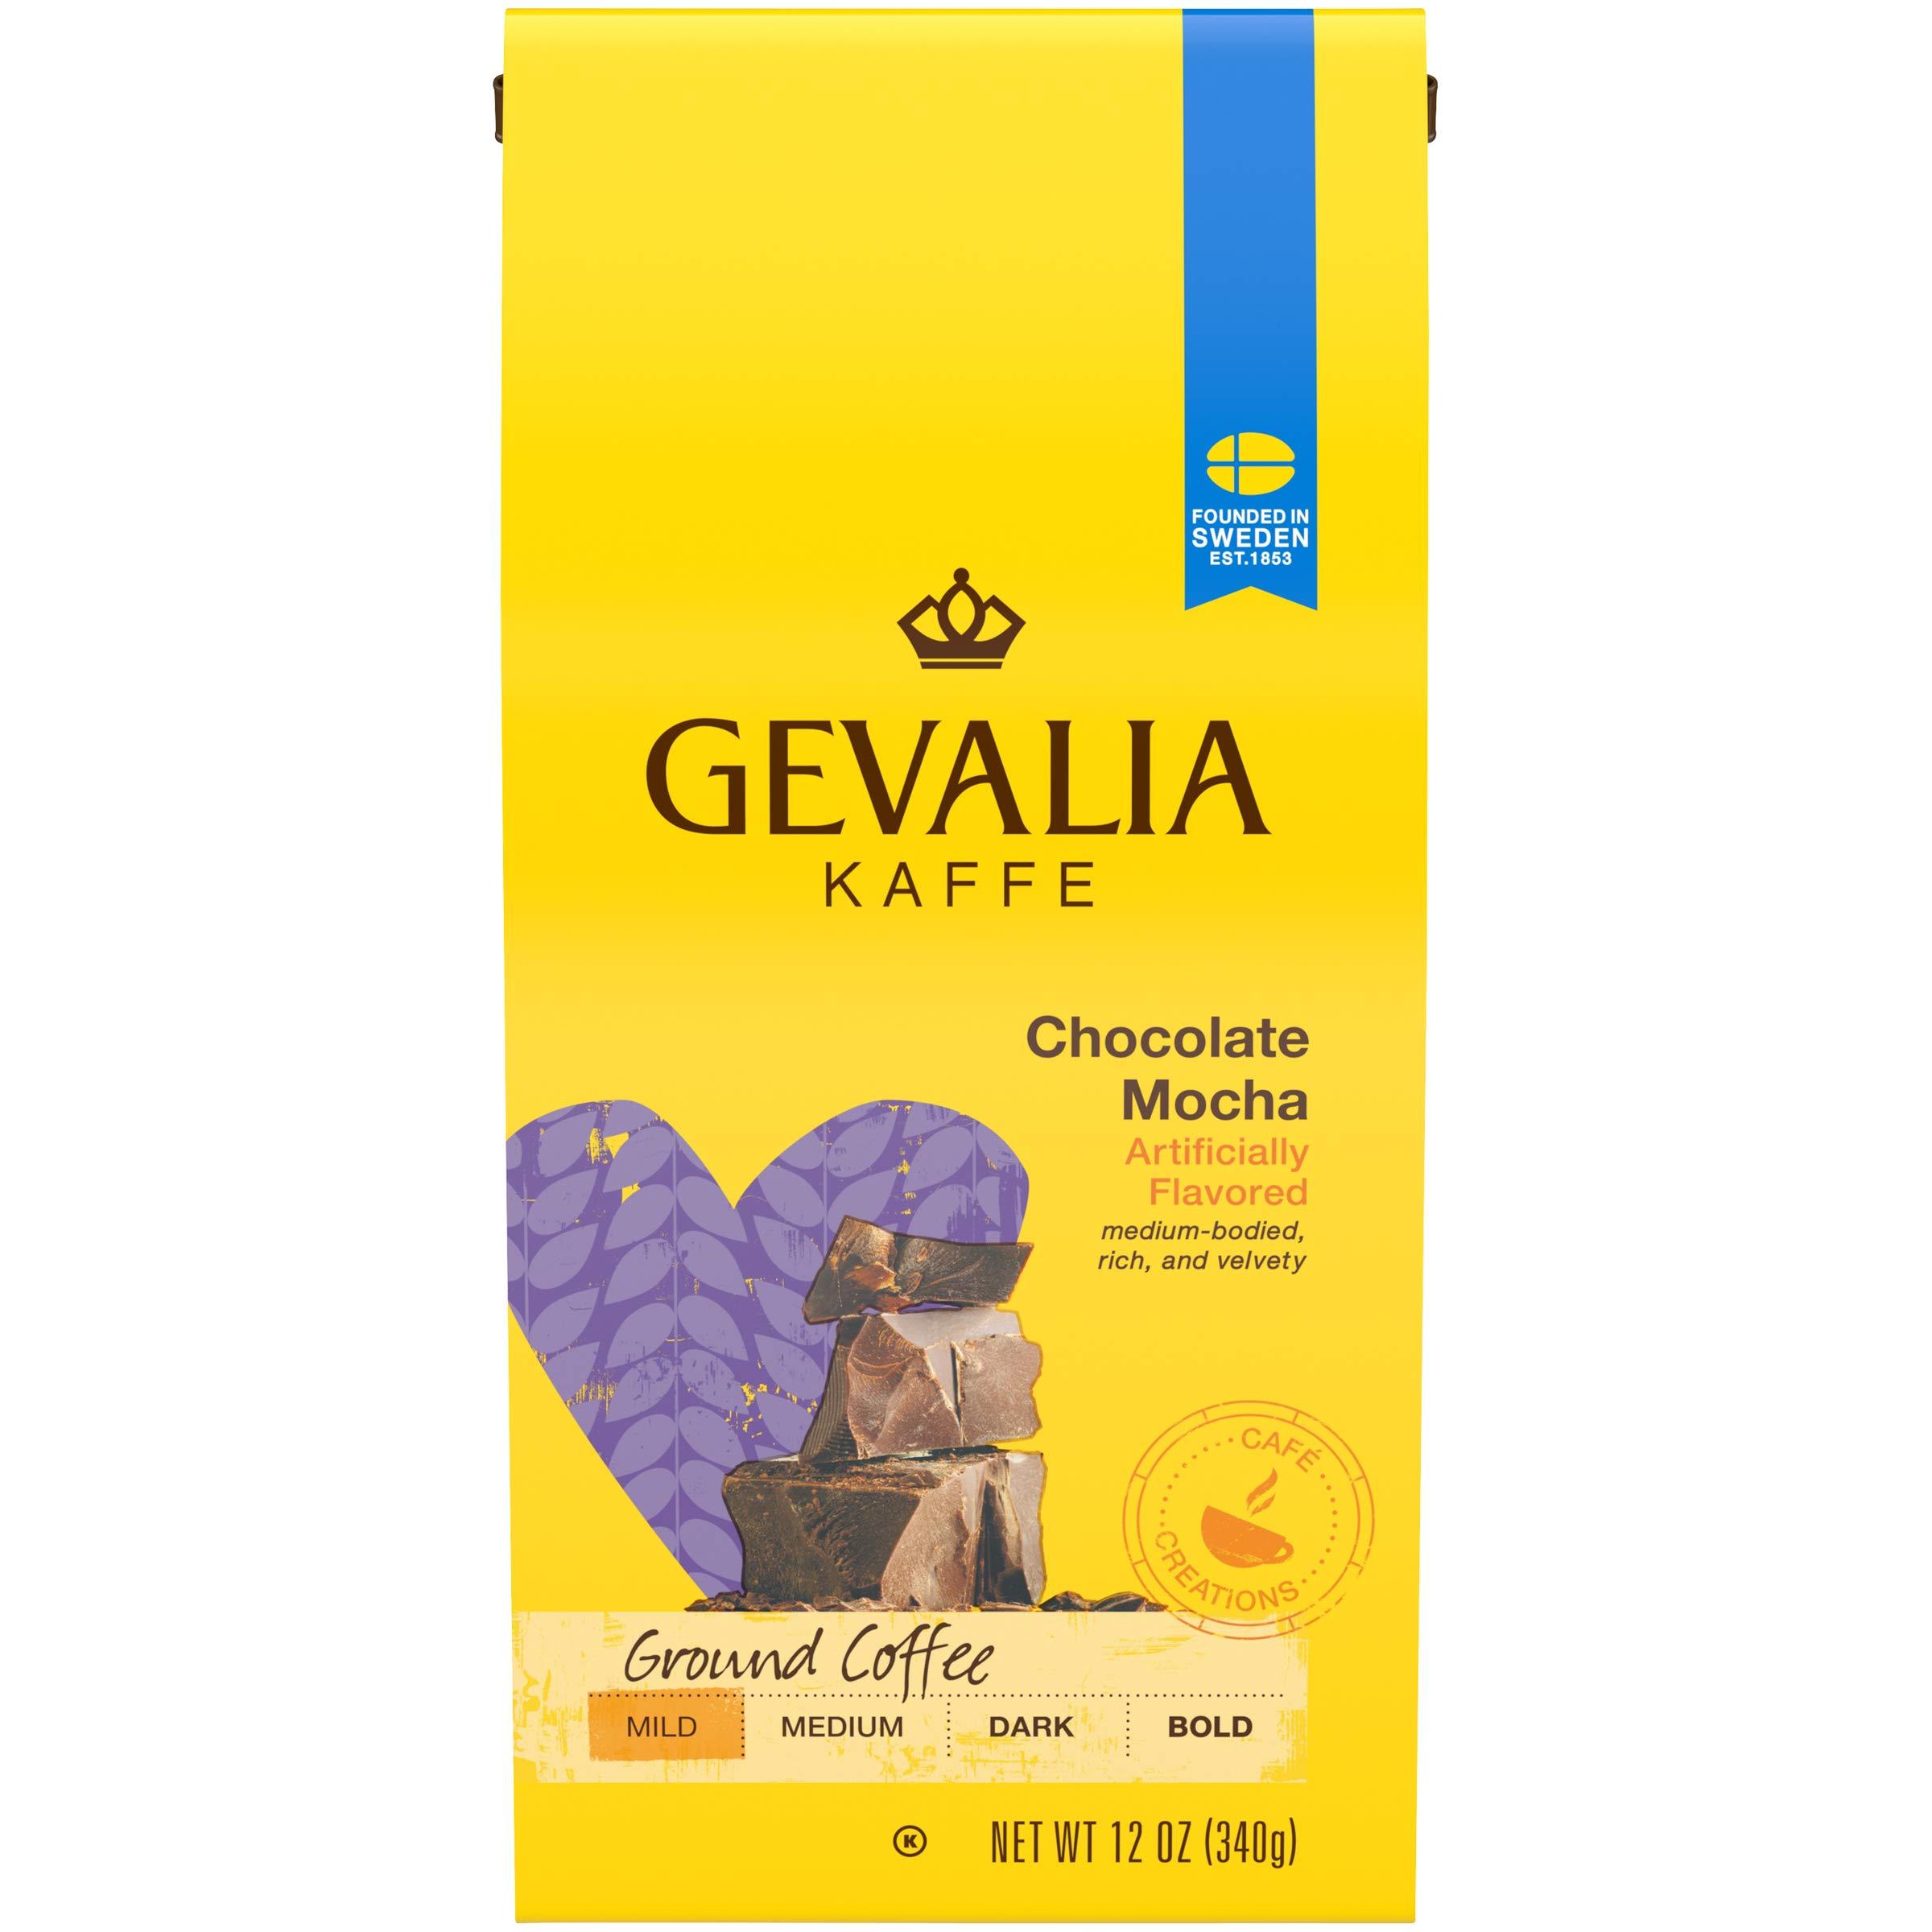 Gevalia Chocolate Mocha Ground Coffee (12 oz Bags, Pack of 6)